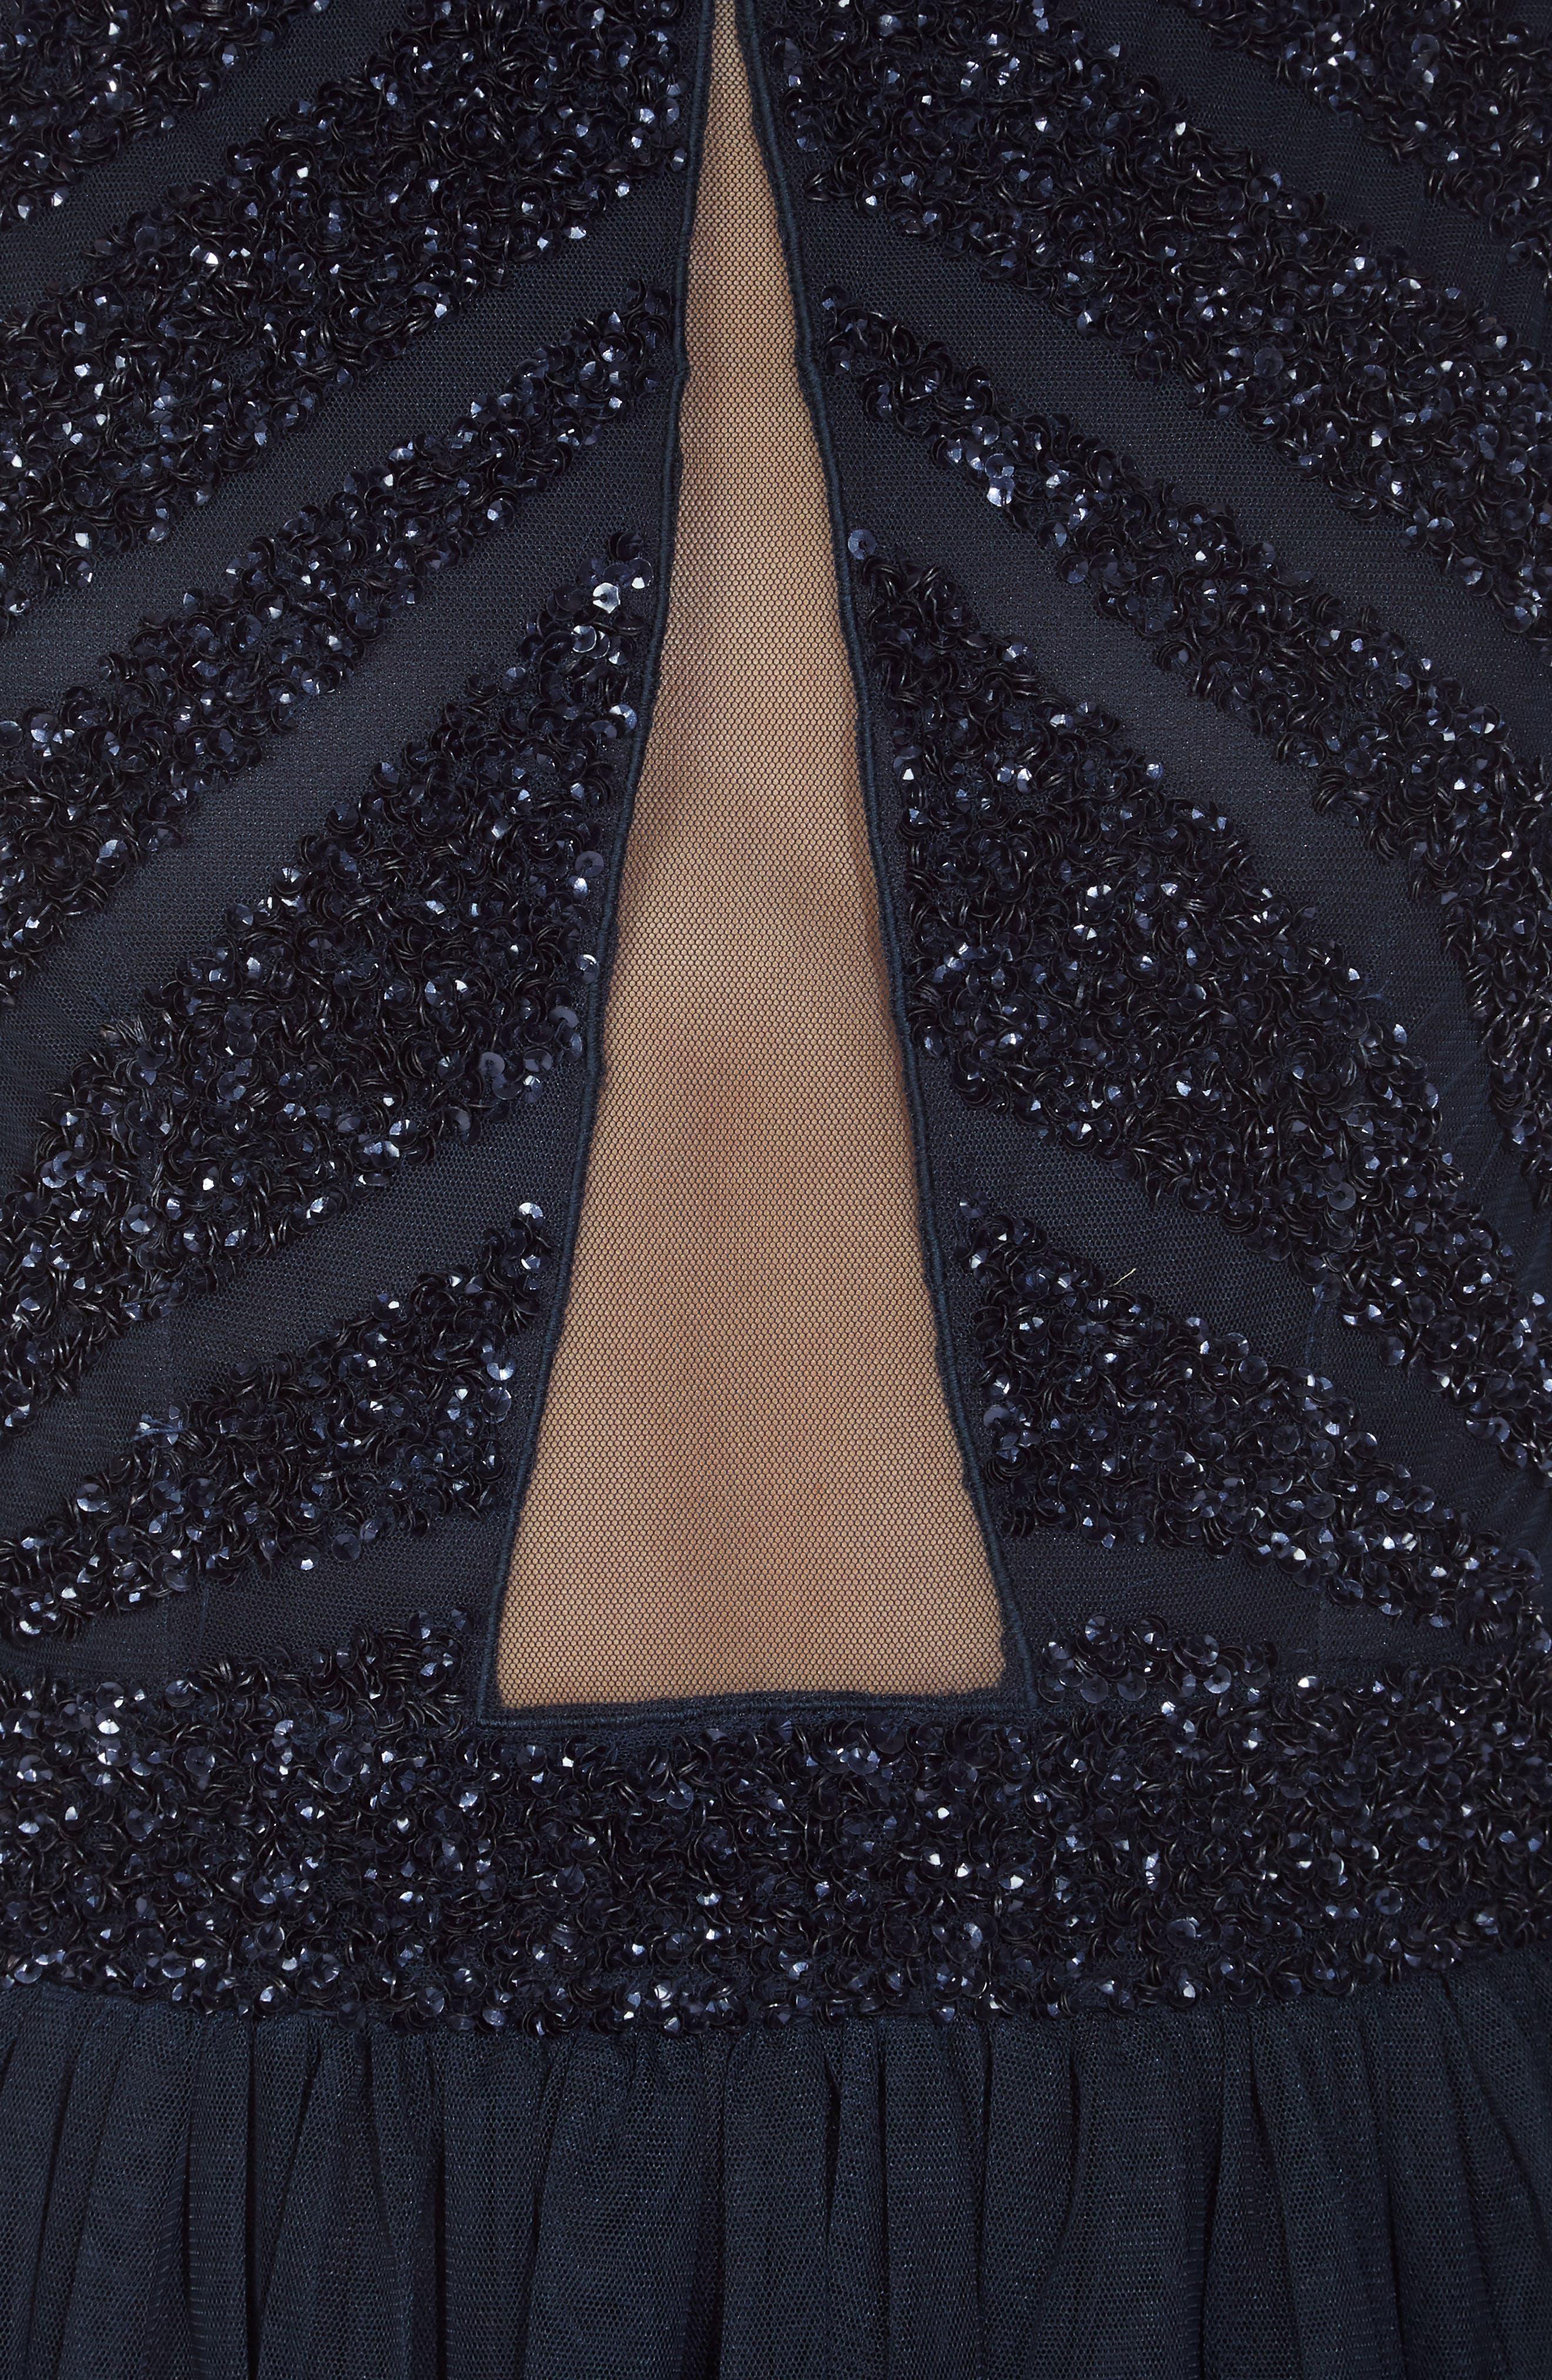 Agatha Embellished Skater Dress,                             Alternate thumbnail 5, color,                             Navy